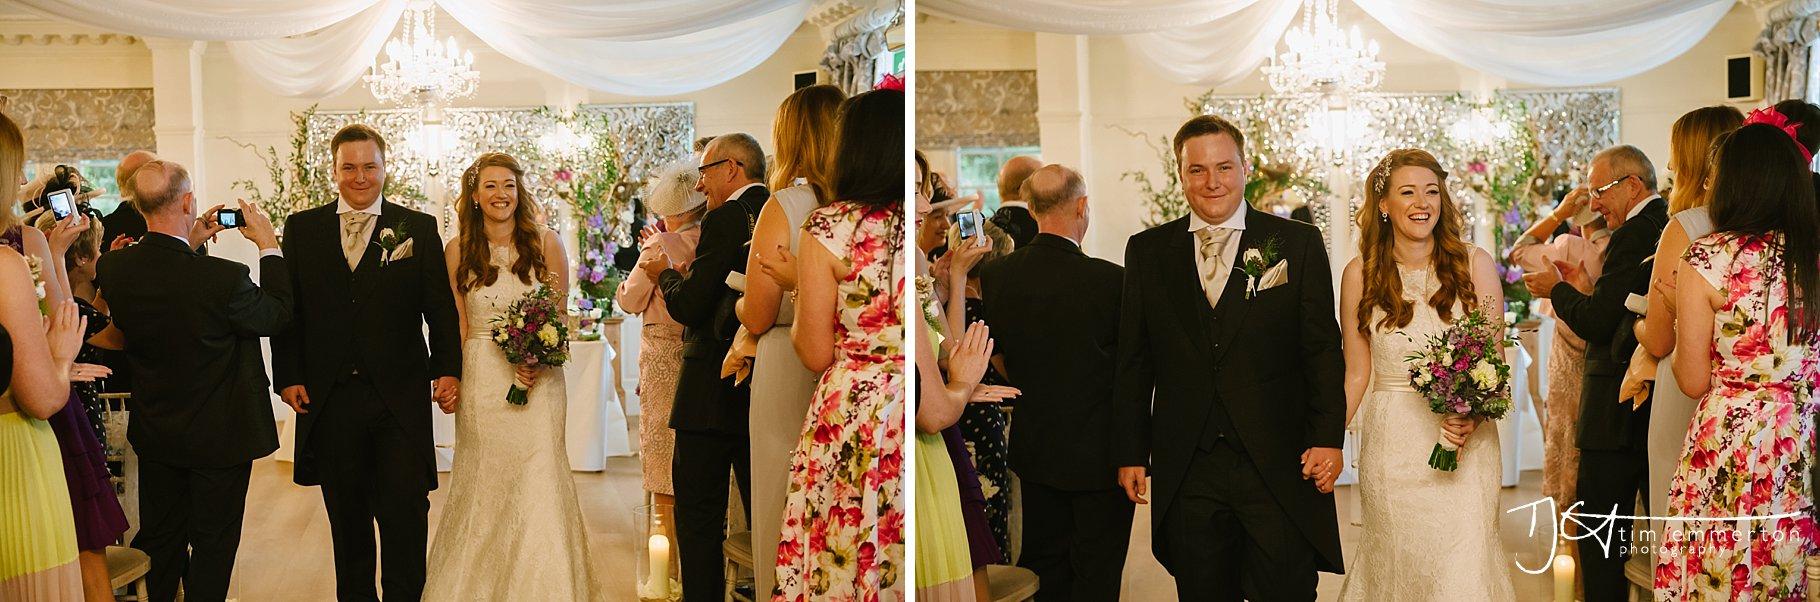 Eaves-Hall-Wedding-Photographer-052.jpg